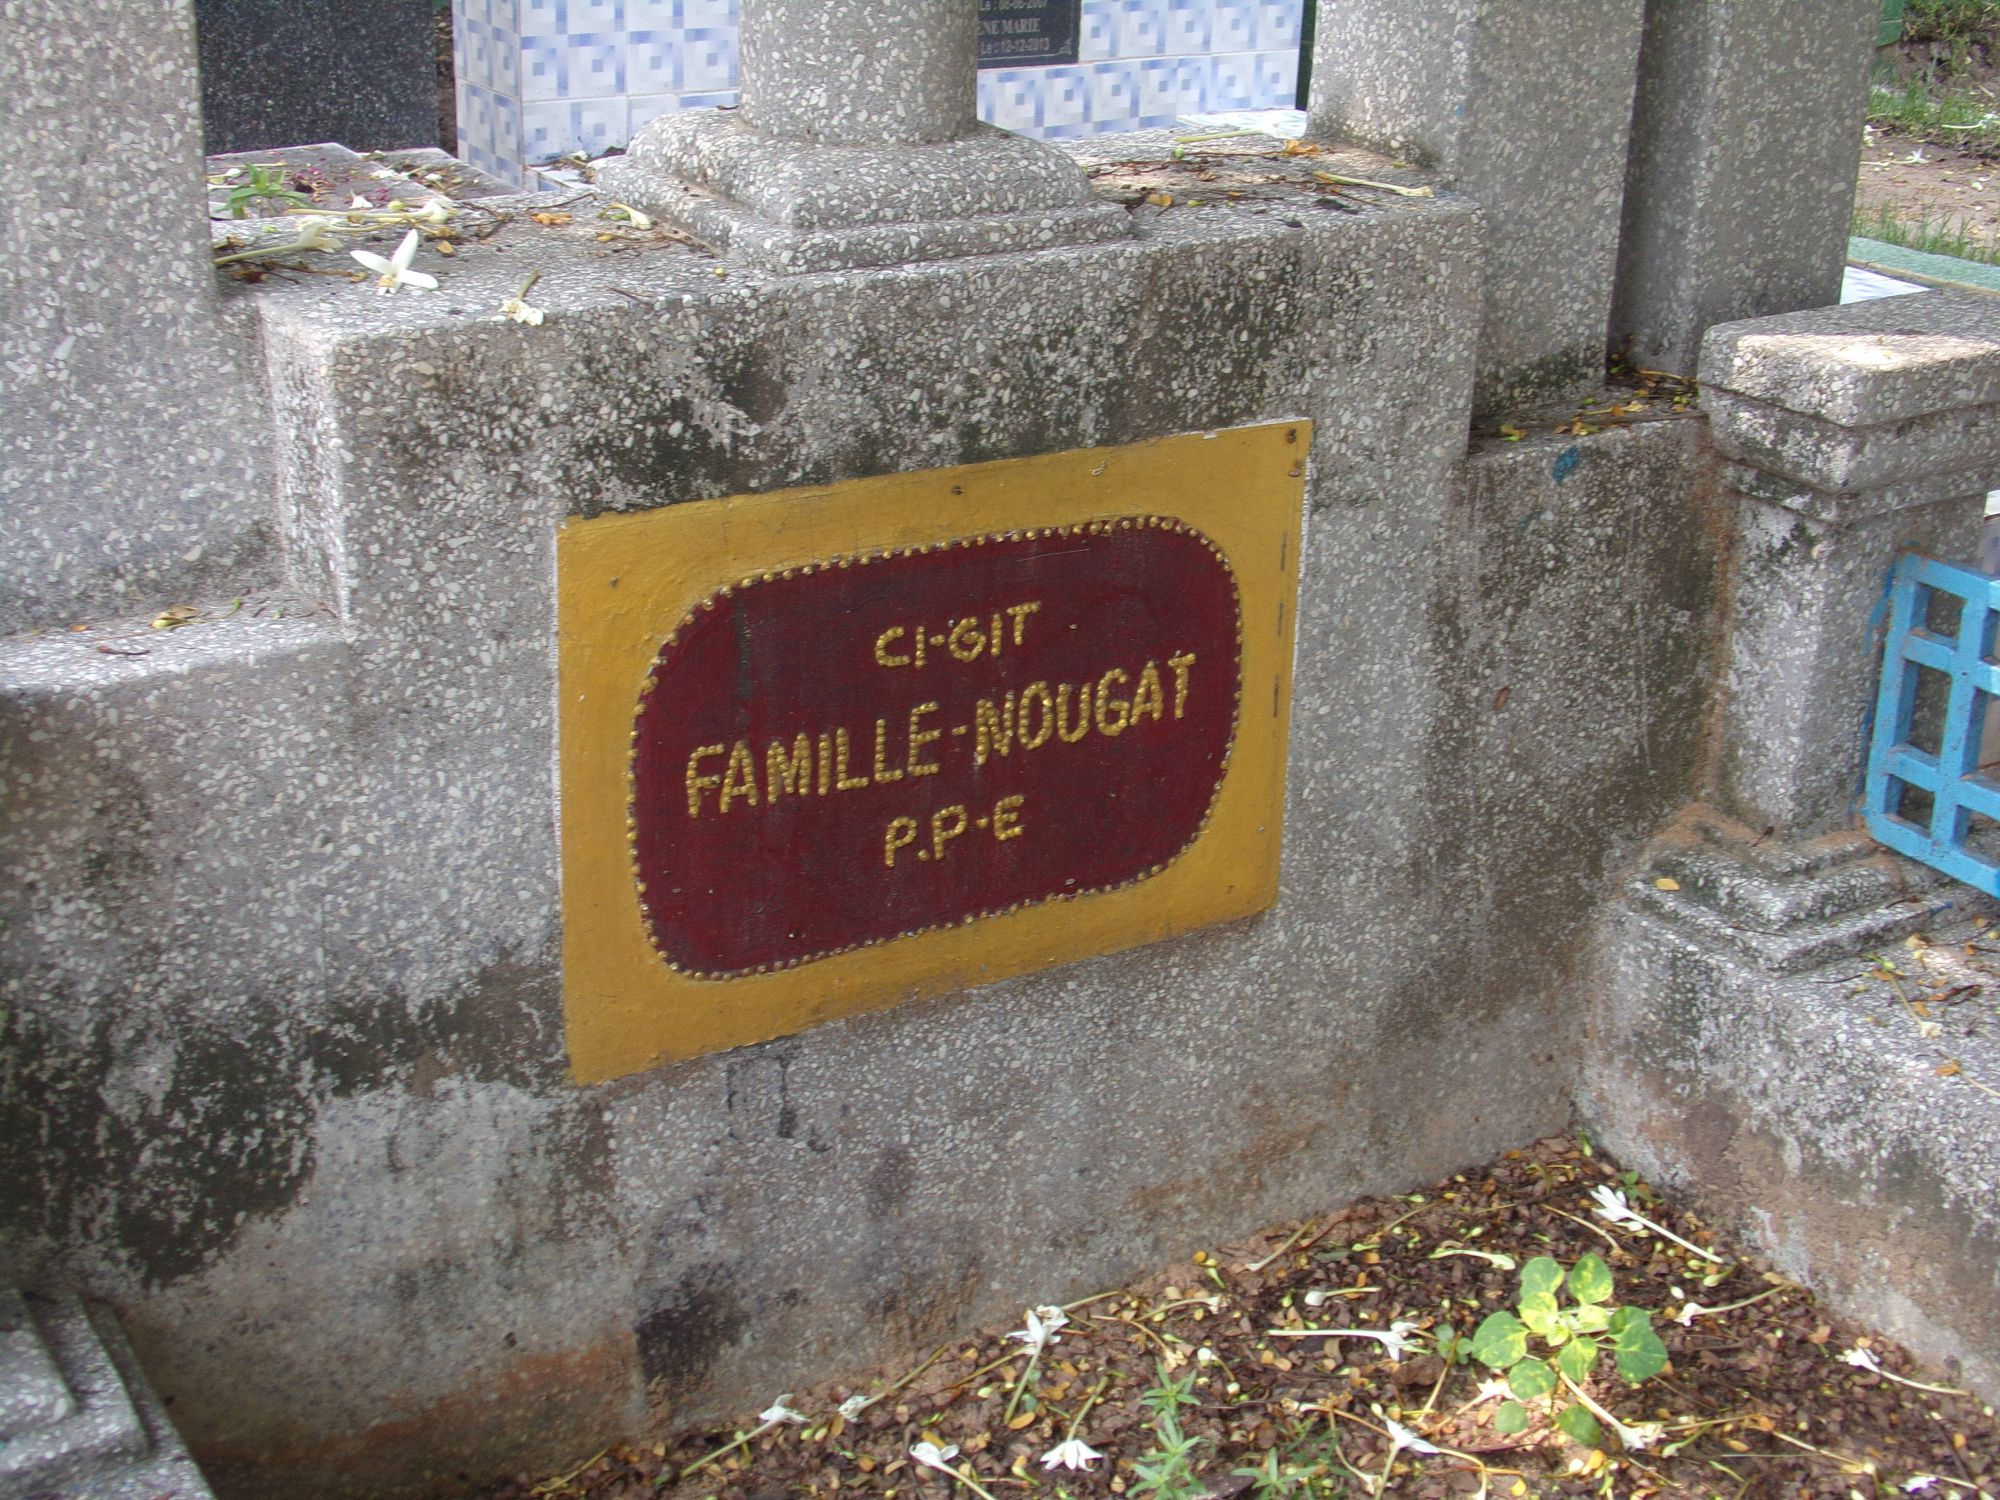 cimetiere francais pondicherry nom francais